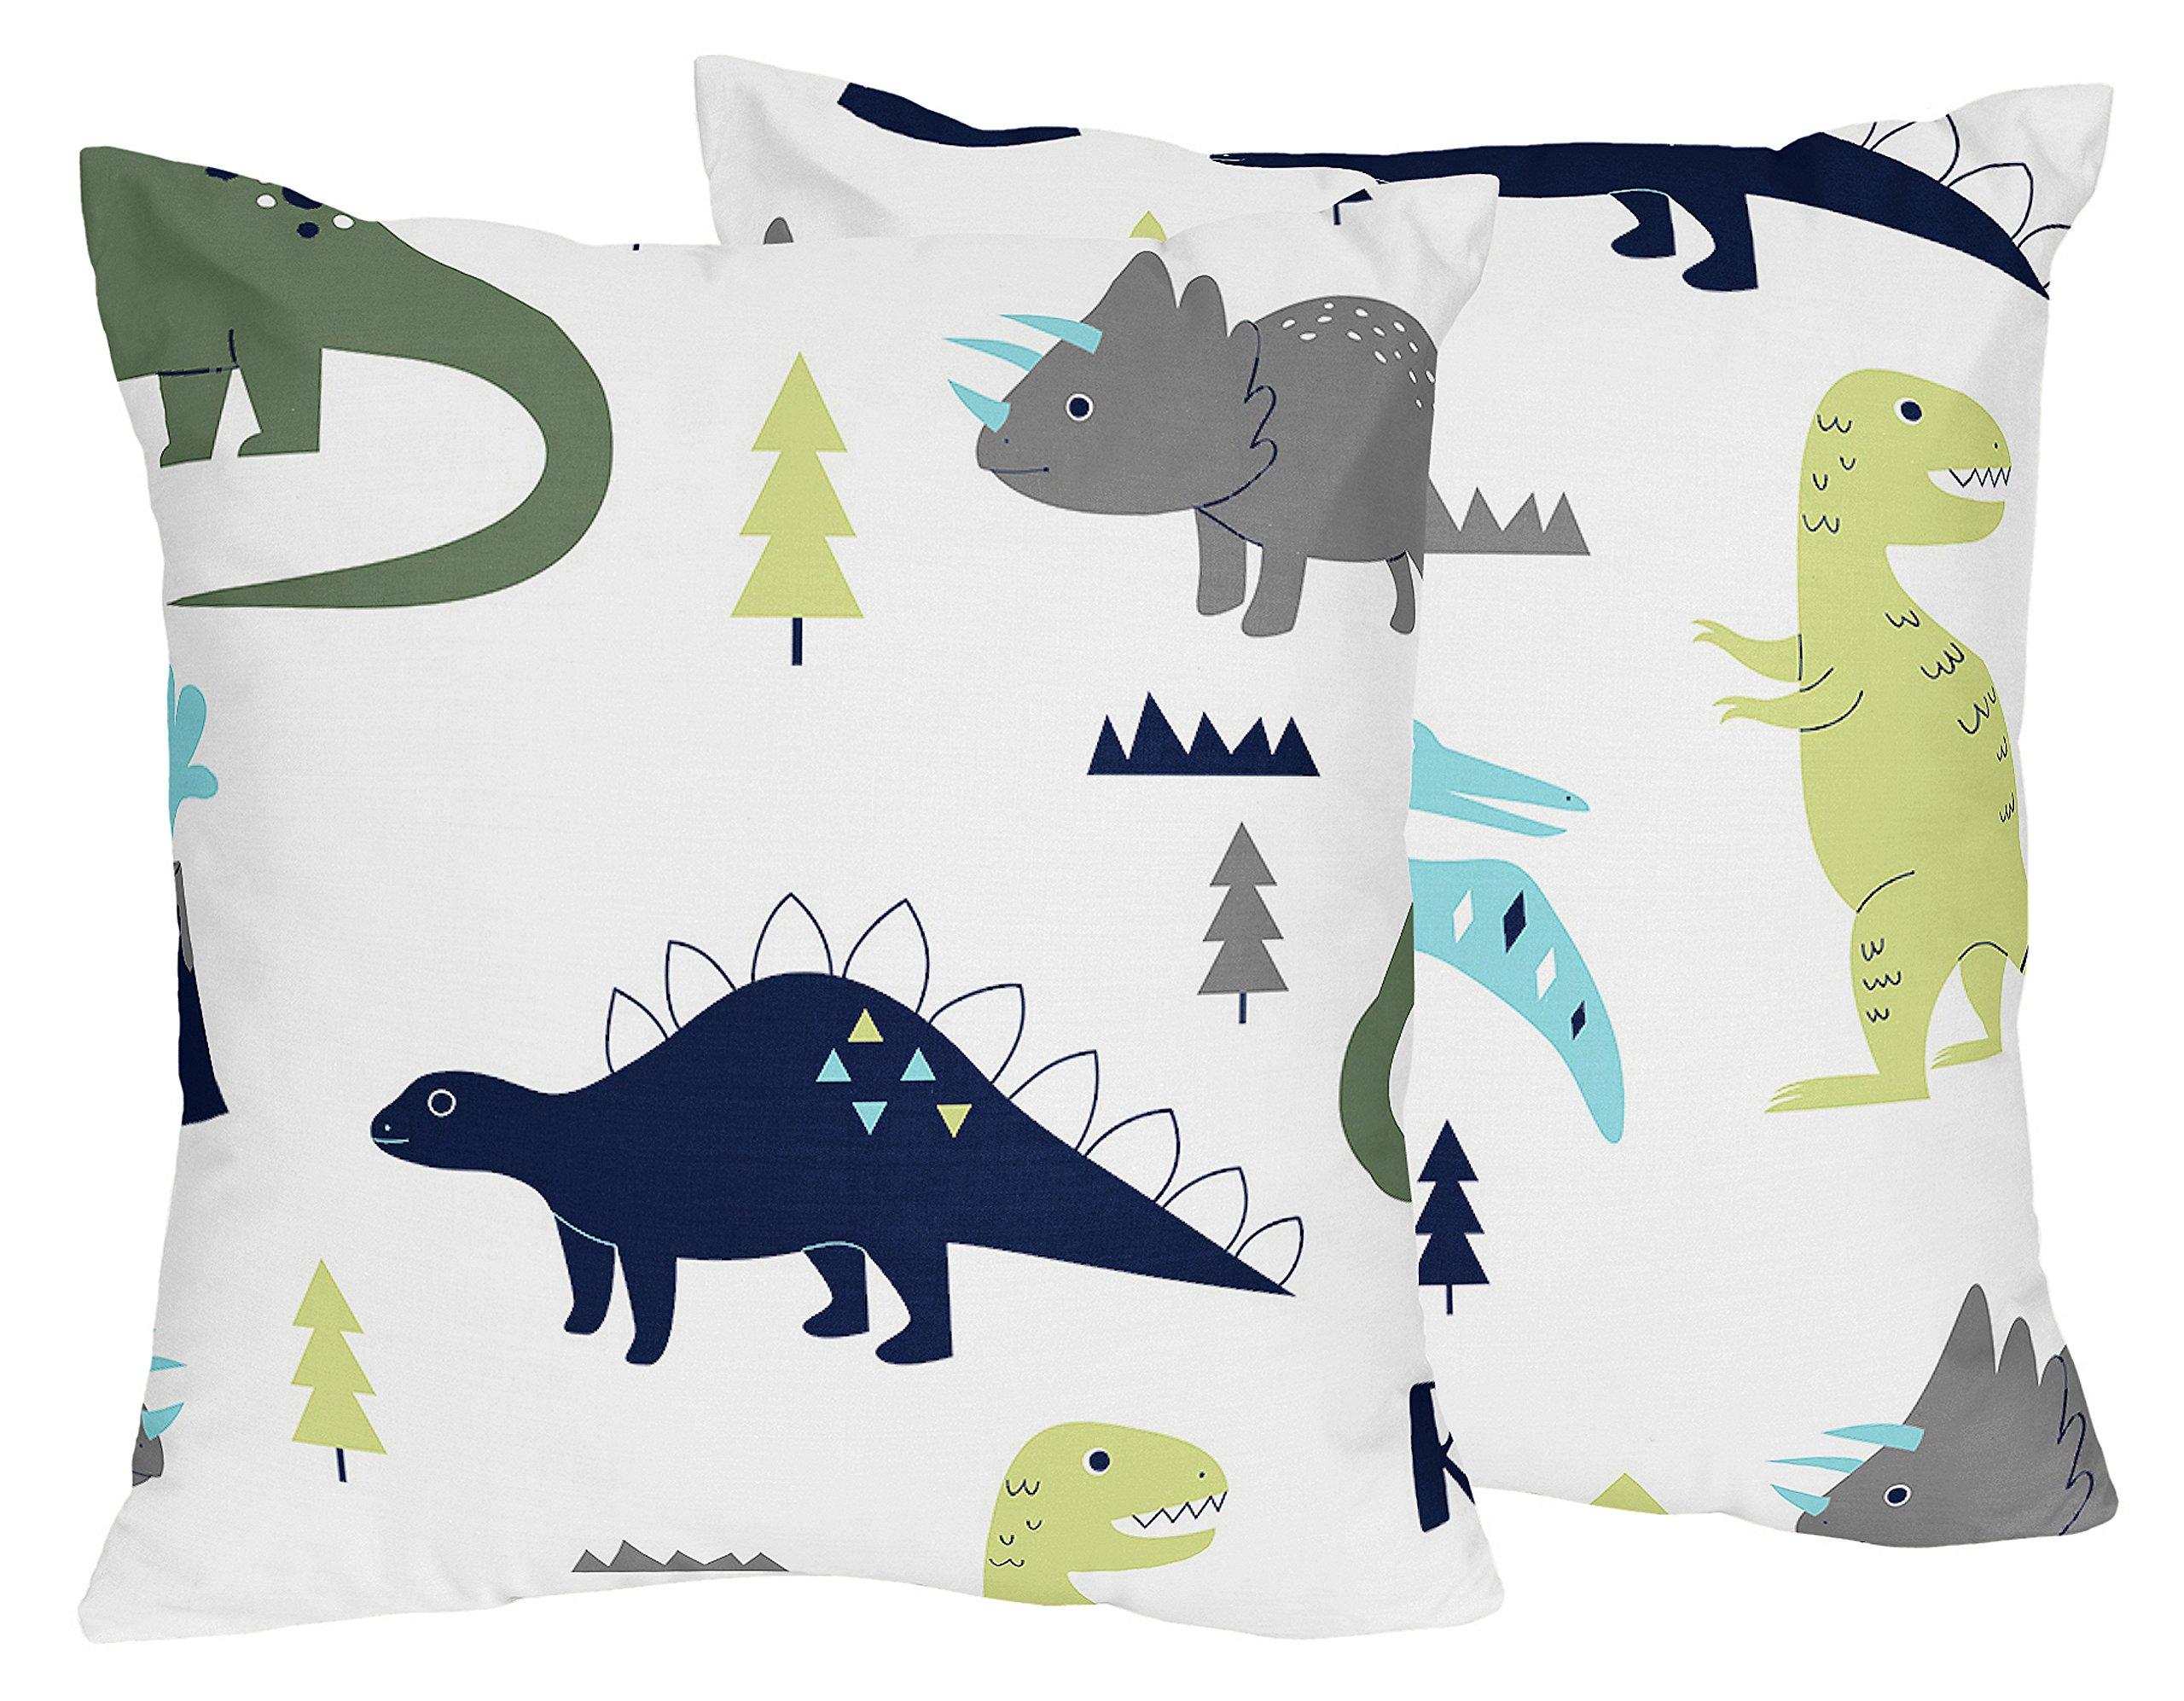 Sweet Jojo Designs 2-Piece Blue and Green Modern Dinosaur Decorative Accent Throw Pillows by Sweet Jojo Designs